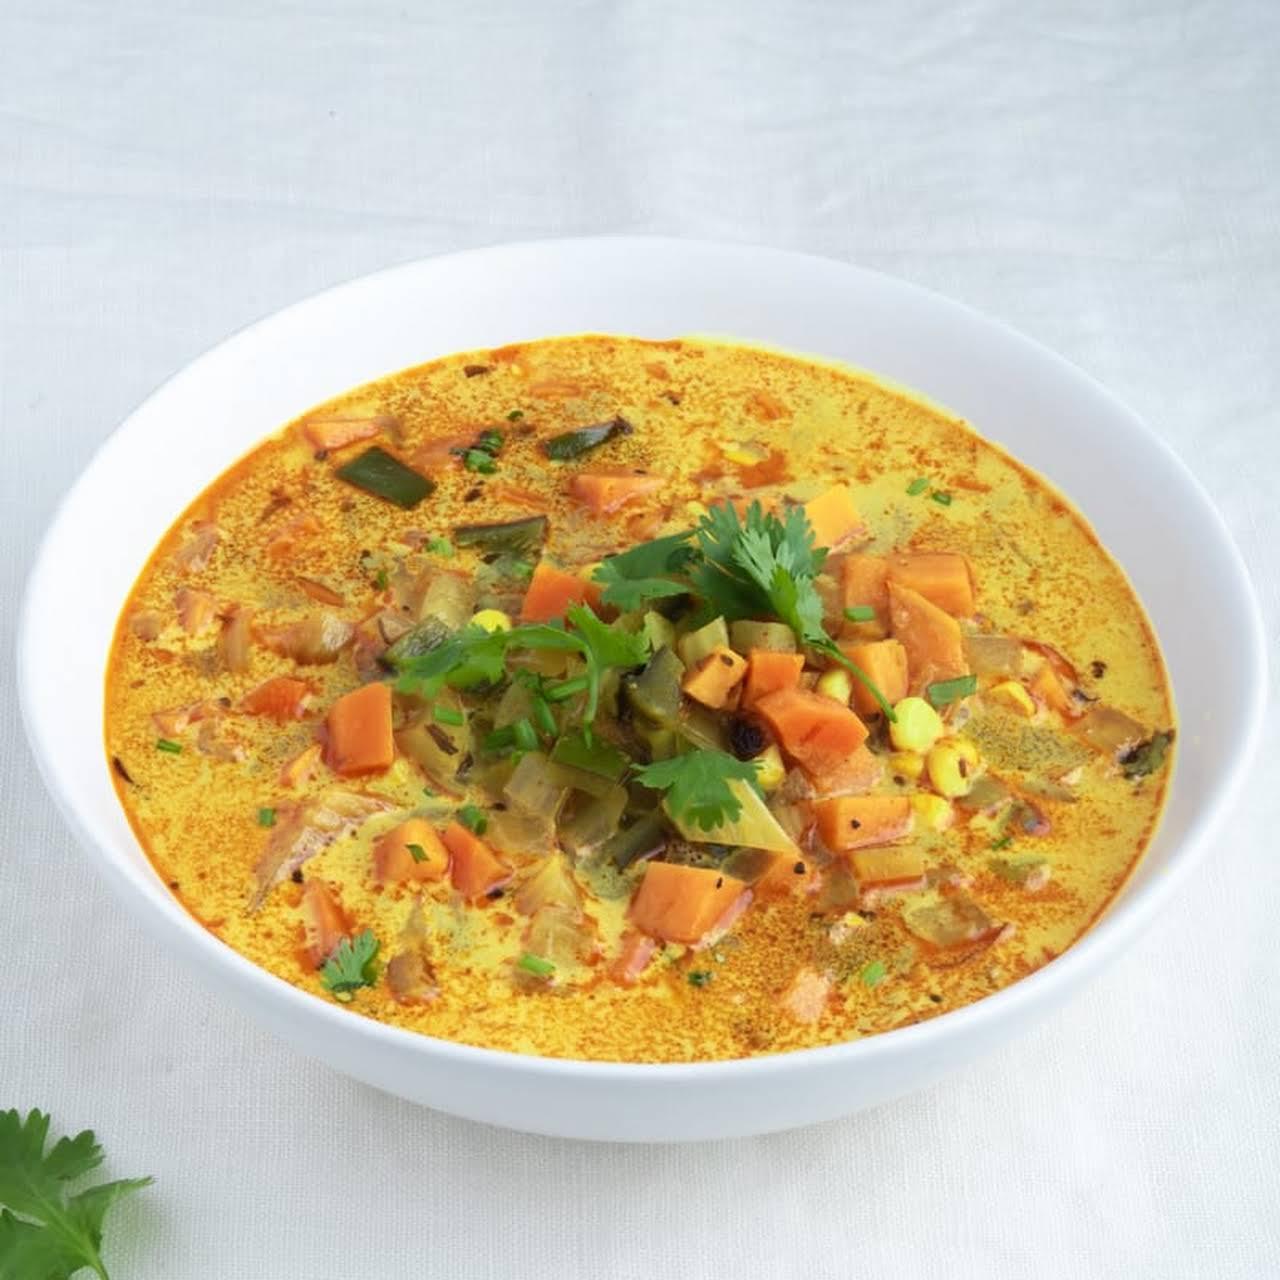 Immunity-Boosting Turmeric Vegetable Soup